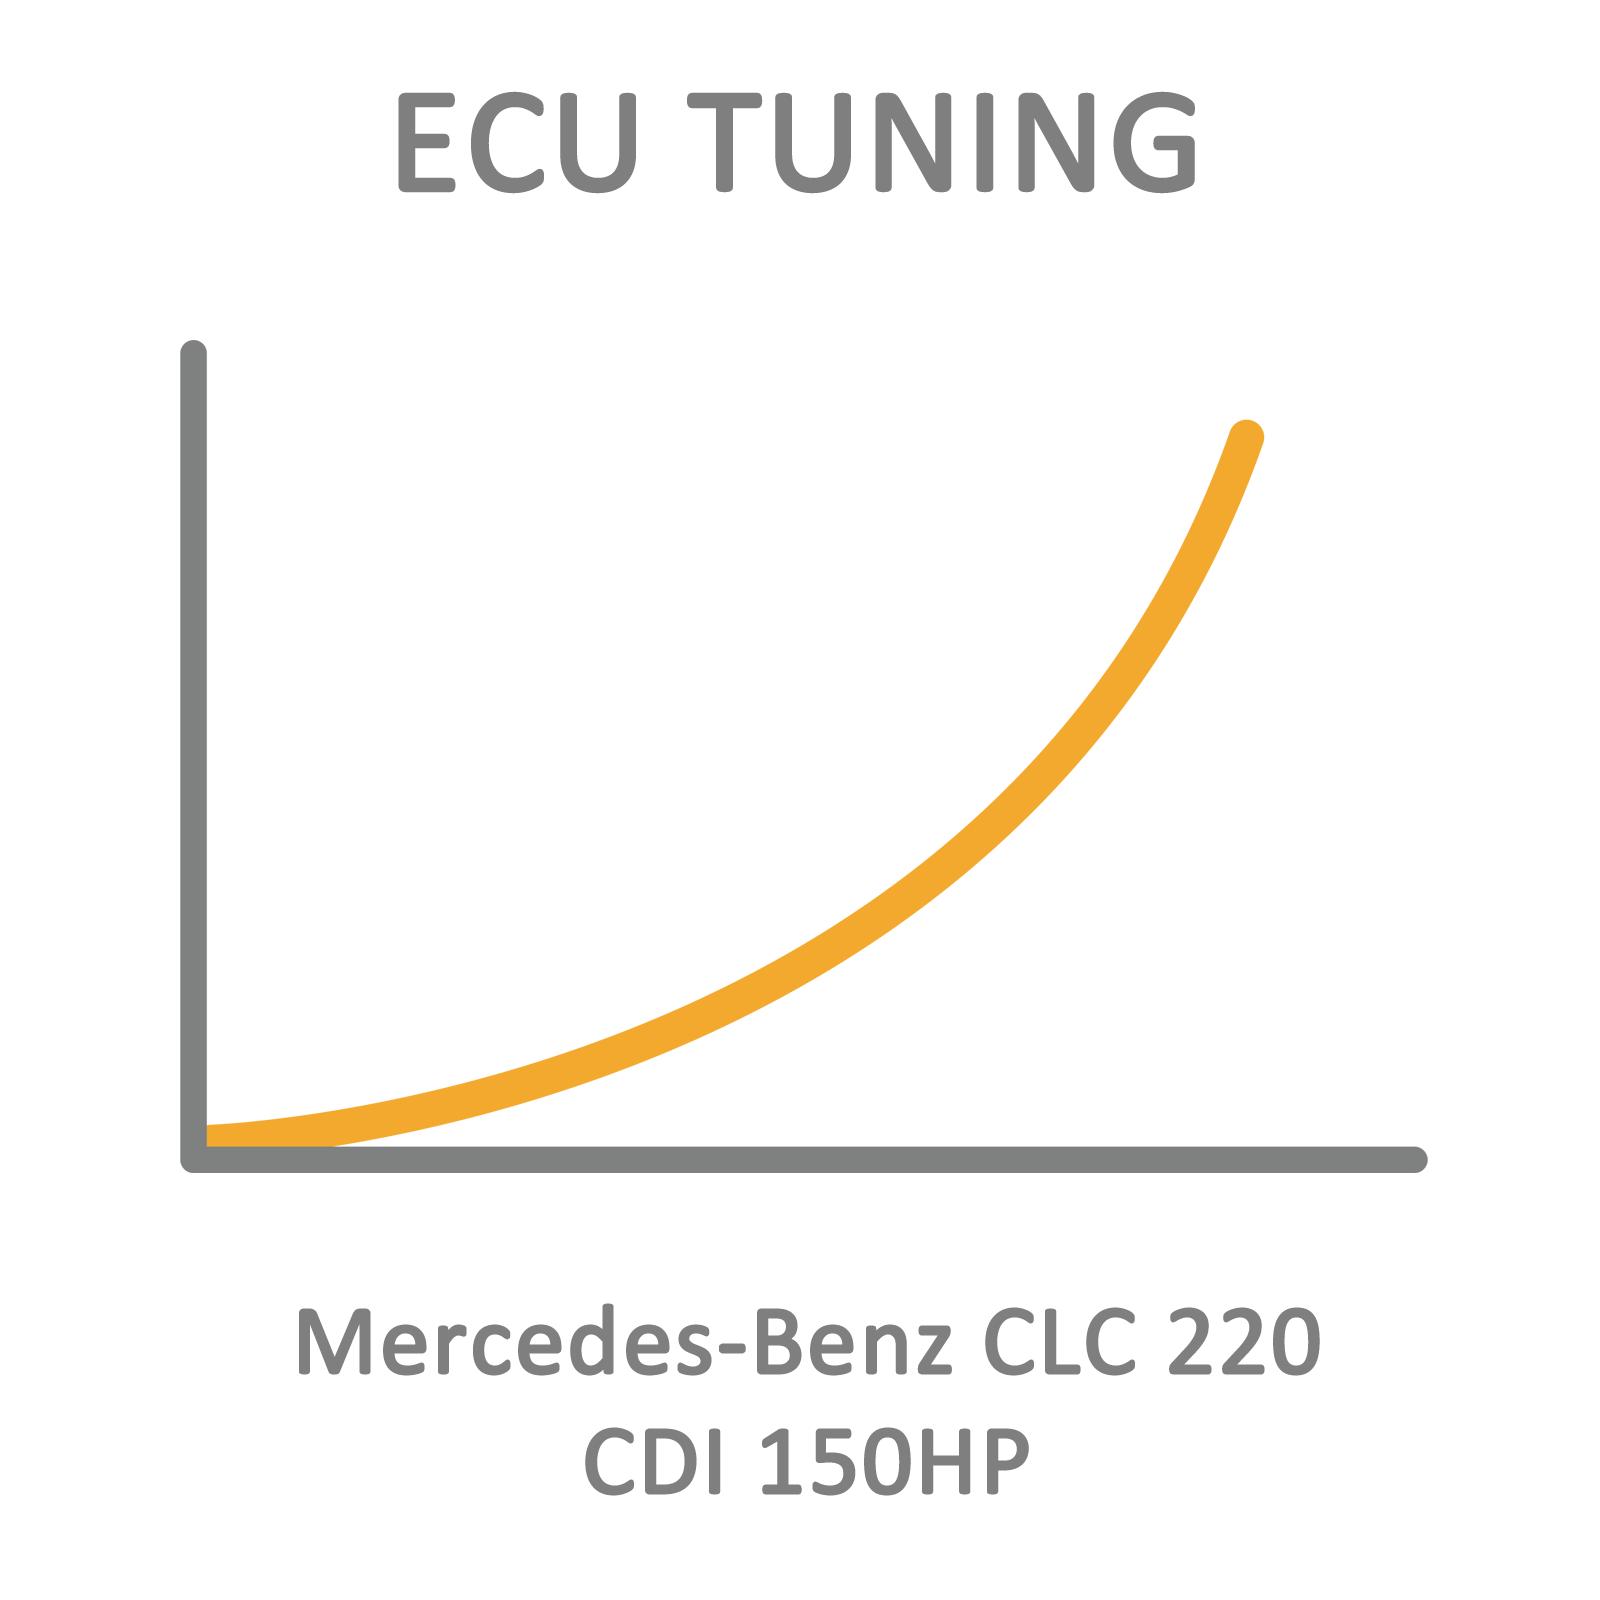 Mercedes-Benz CLC 220 CDI 150HP ECU Tuning Remapping